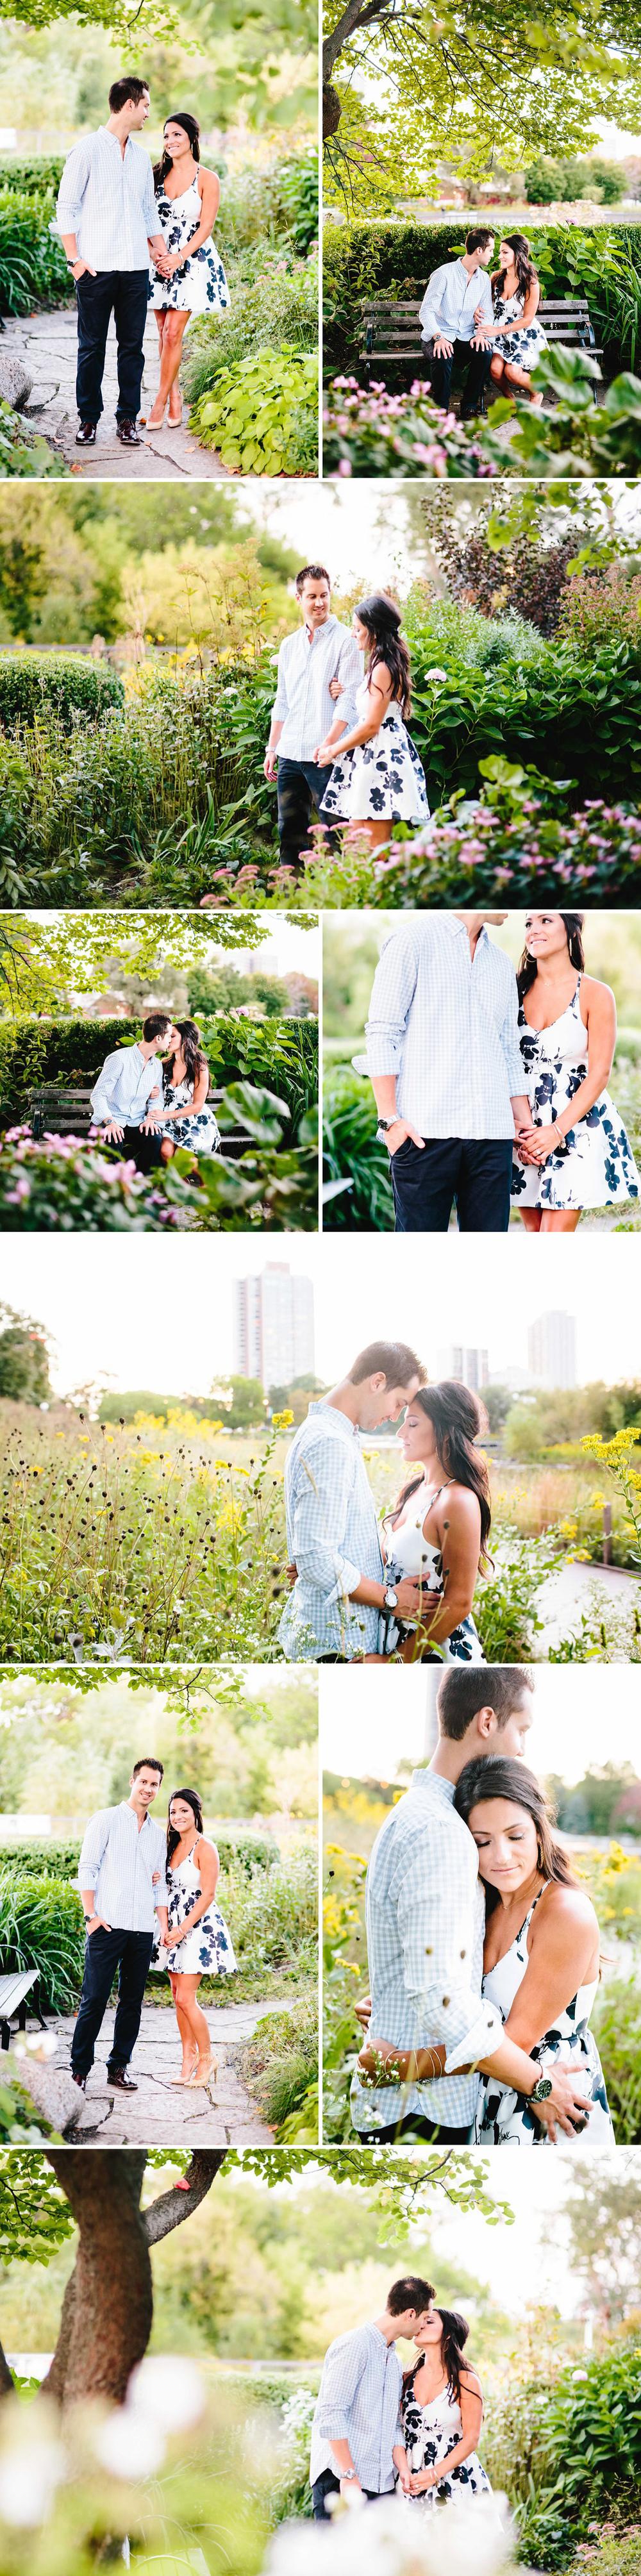 chicago-fine-art-wedding-photography-rock-jen2